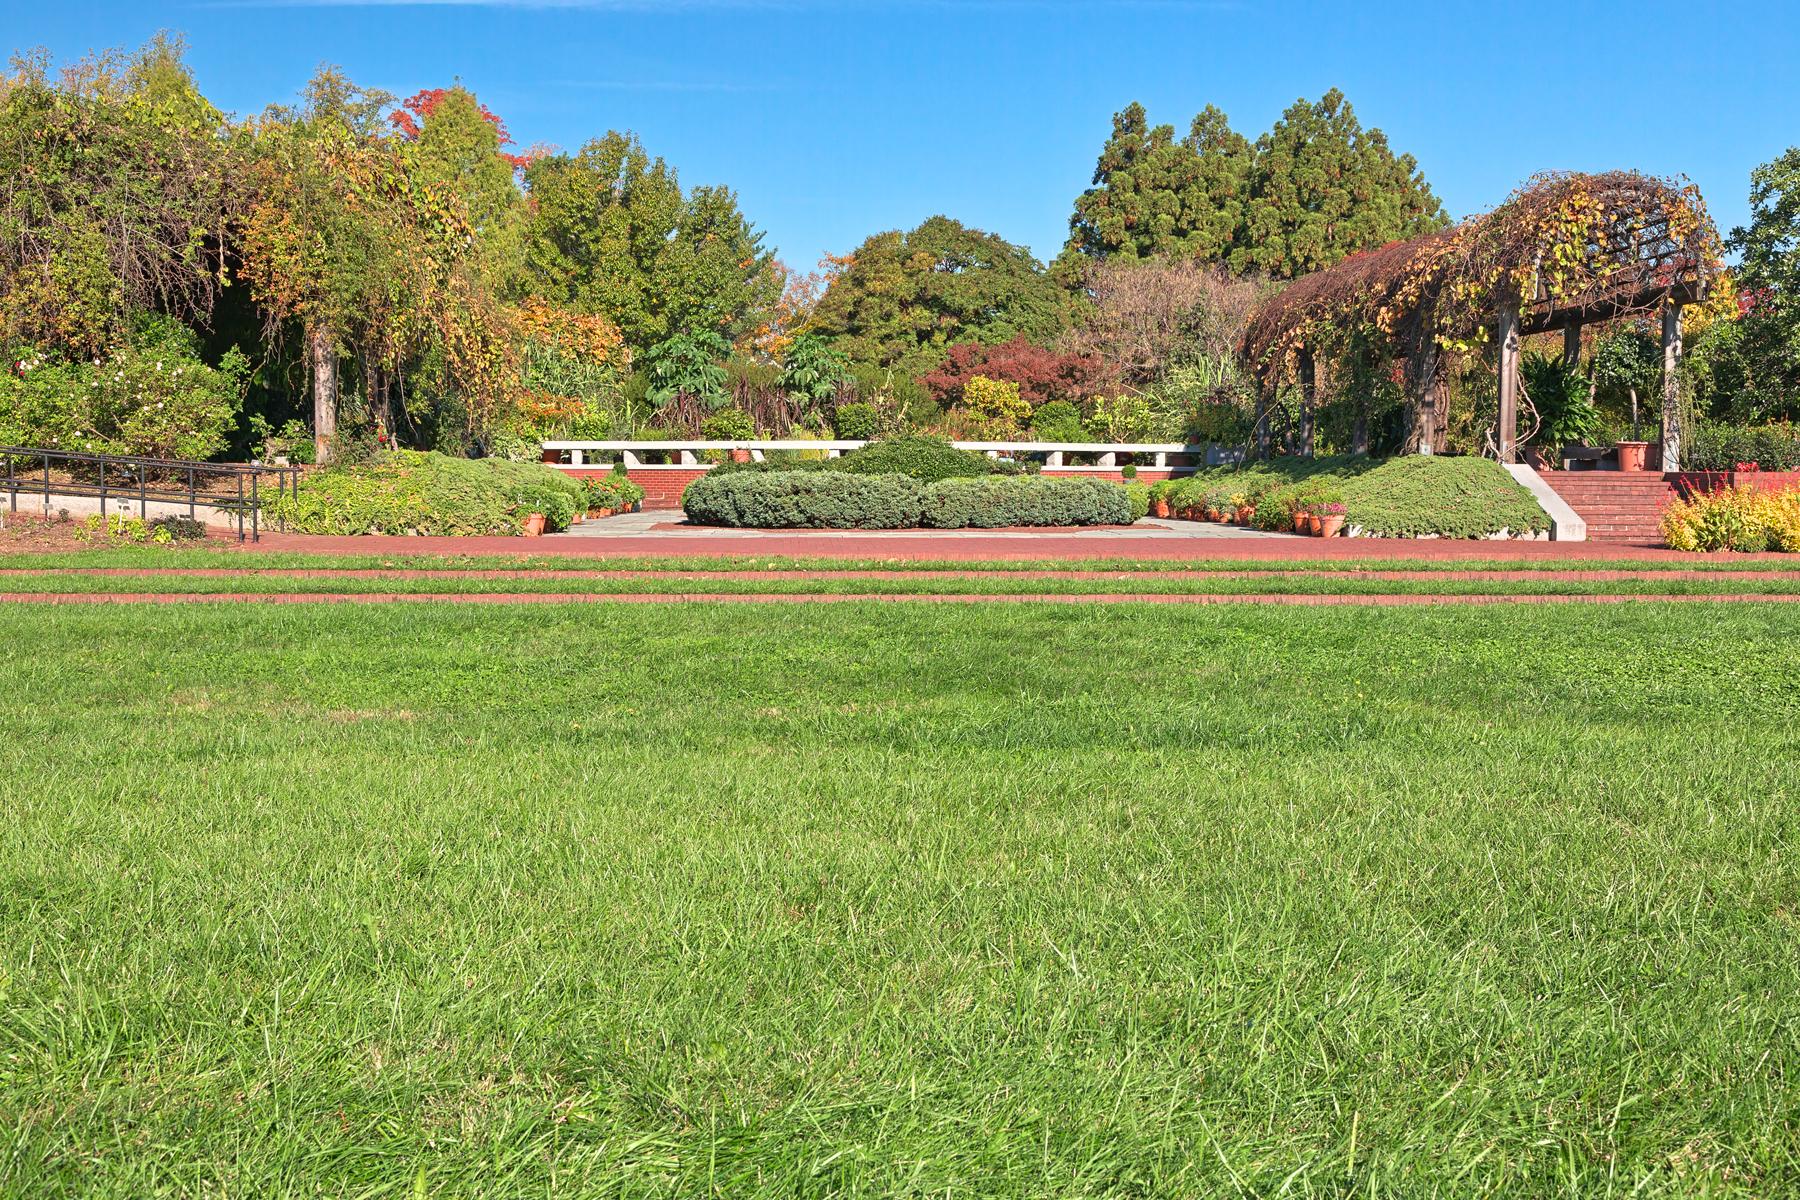 Arboretum herb garden - hdr photo